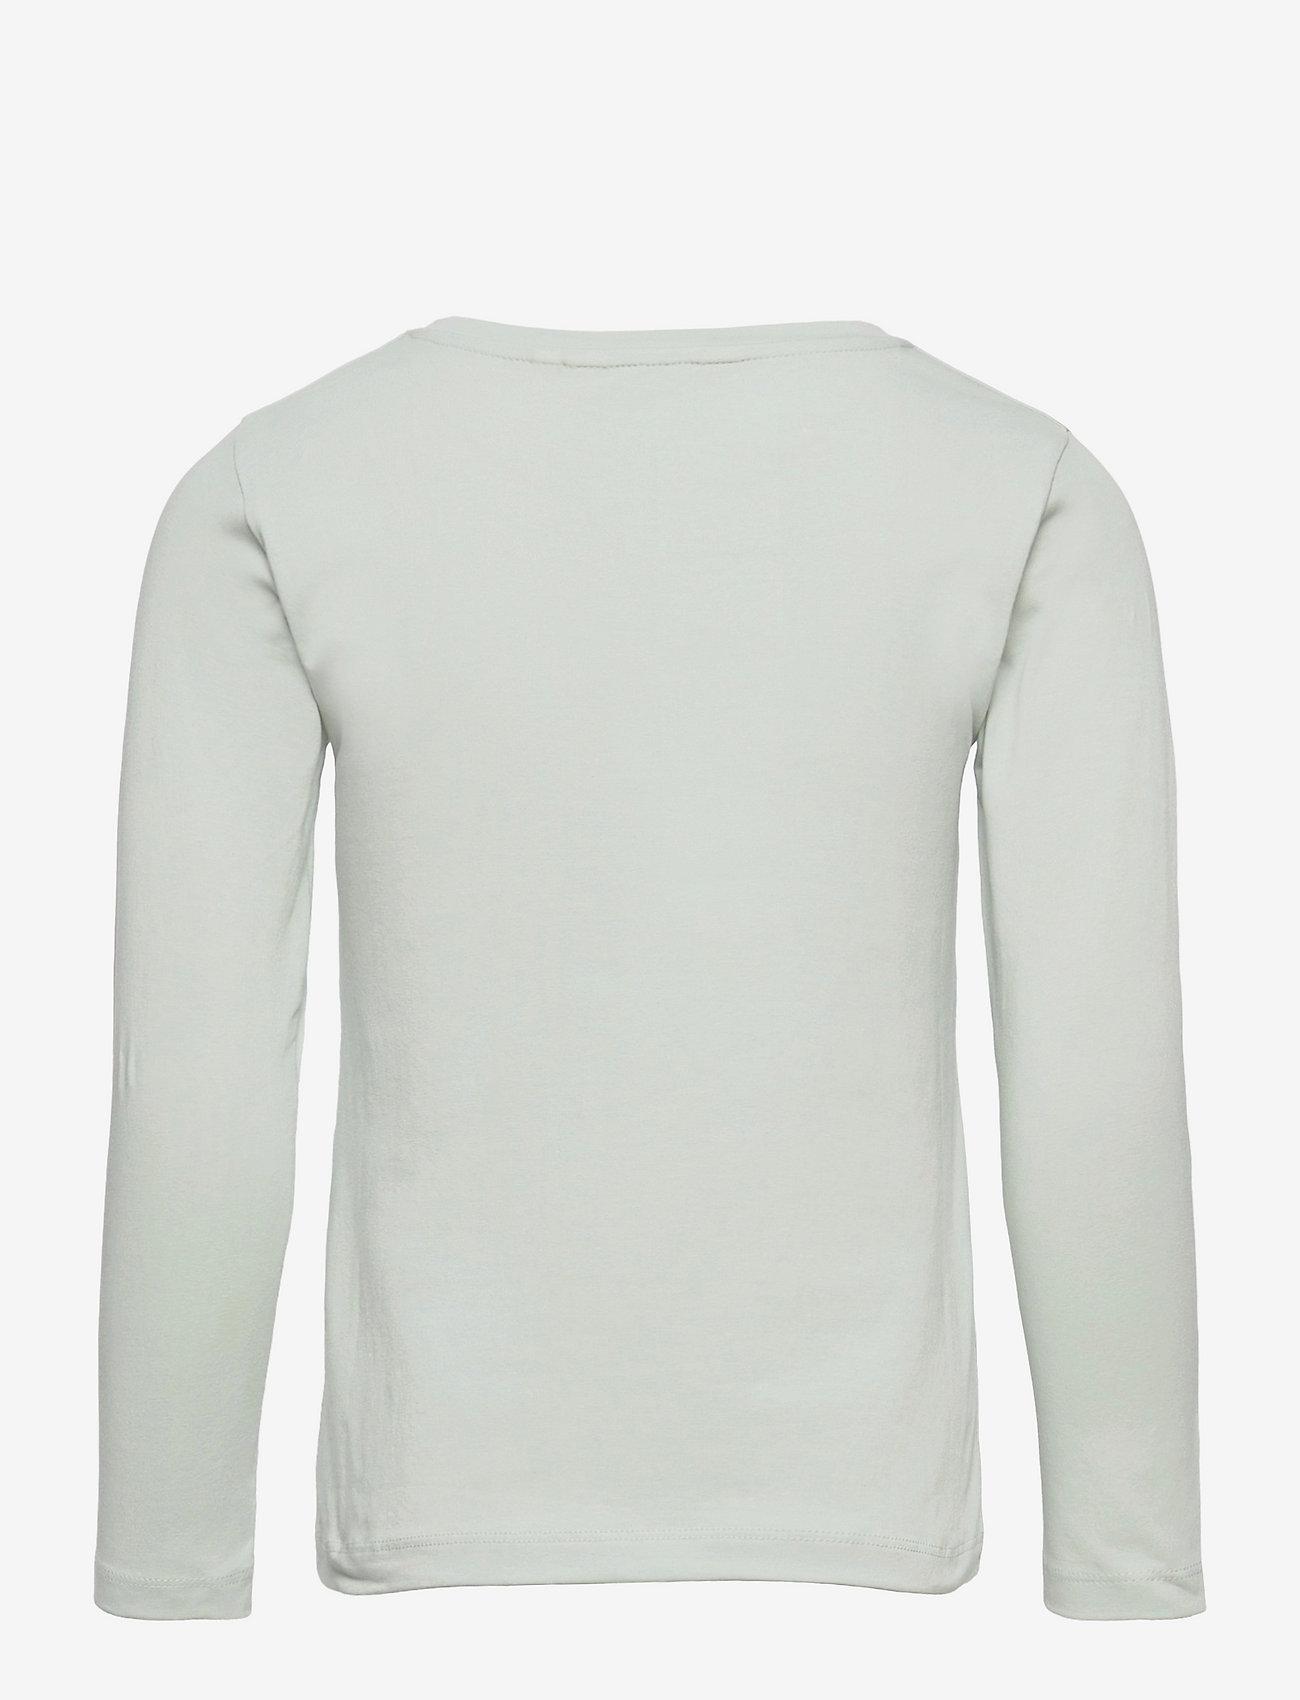 Marimekko - OULI UNIKKO PLACEMENT - langærmede t-shirts - light blue, off white, light green - 1